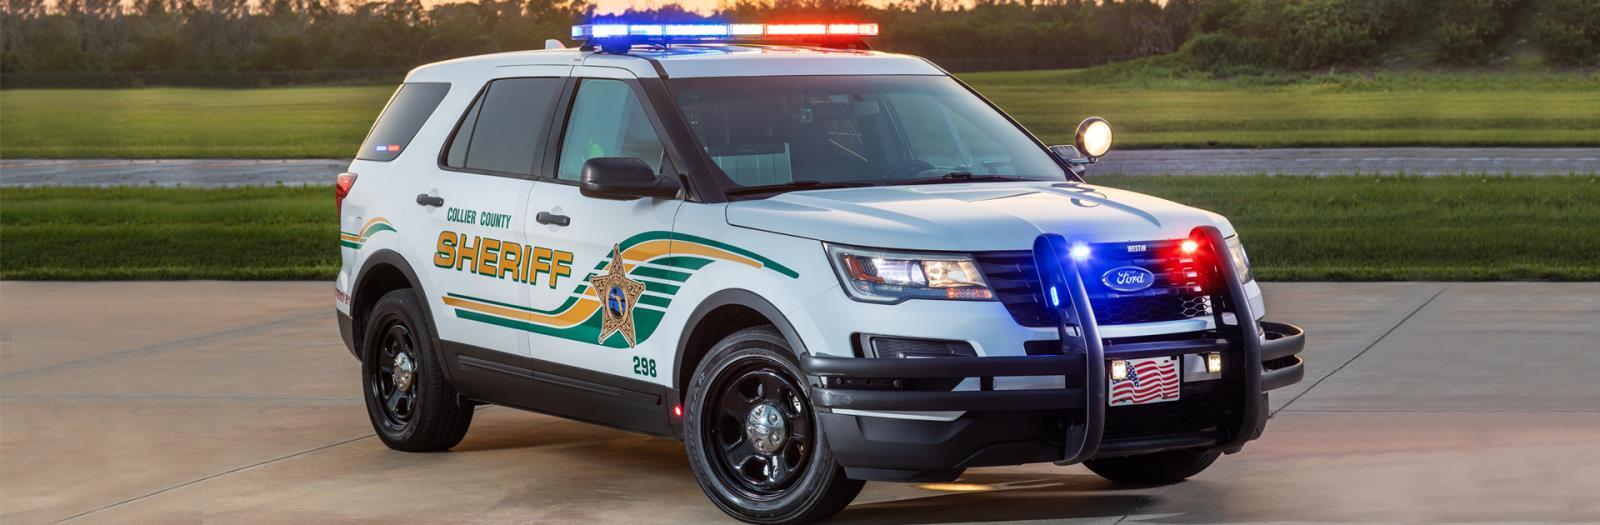 Collier County, FL Sheriff | Sheriff Kevin J Rambosk, Naples FL